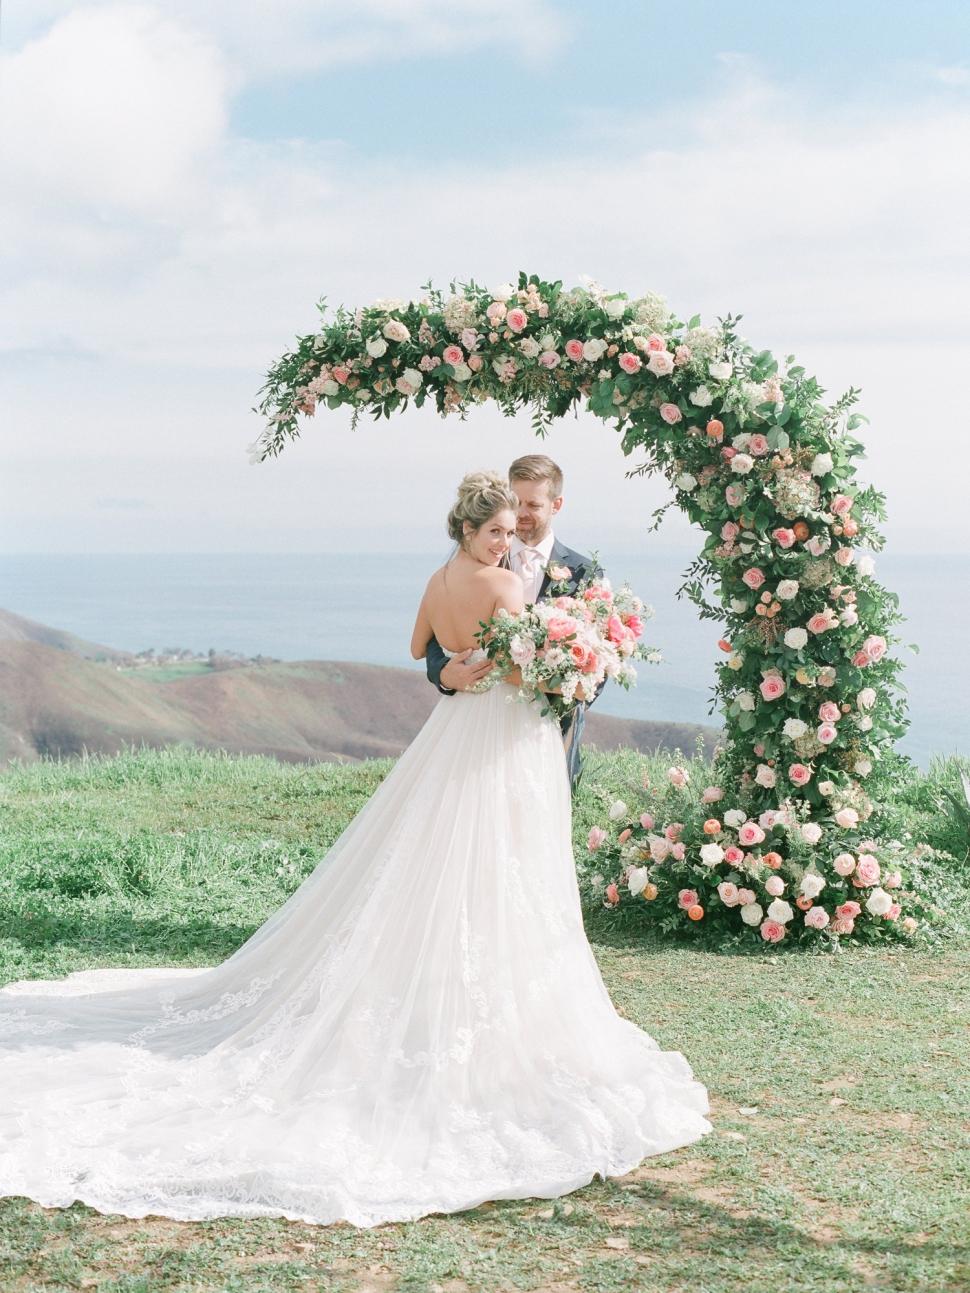 Southern-California-Malibu-Wedding-Photographer-Cassi-Claire-Deer-Creek-Ridge-Wedding_22.jpg